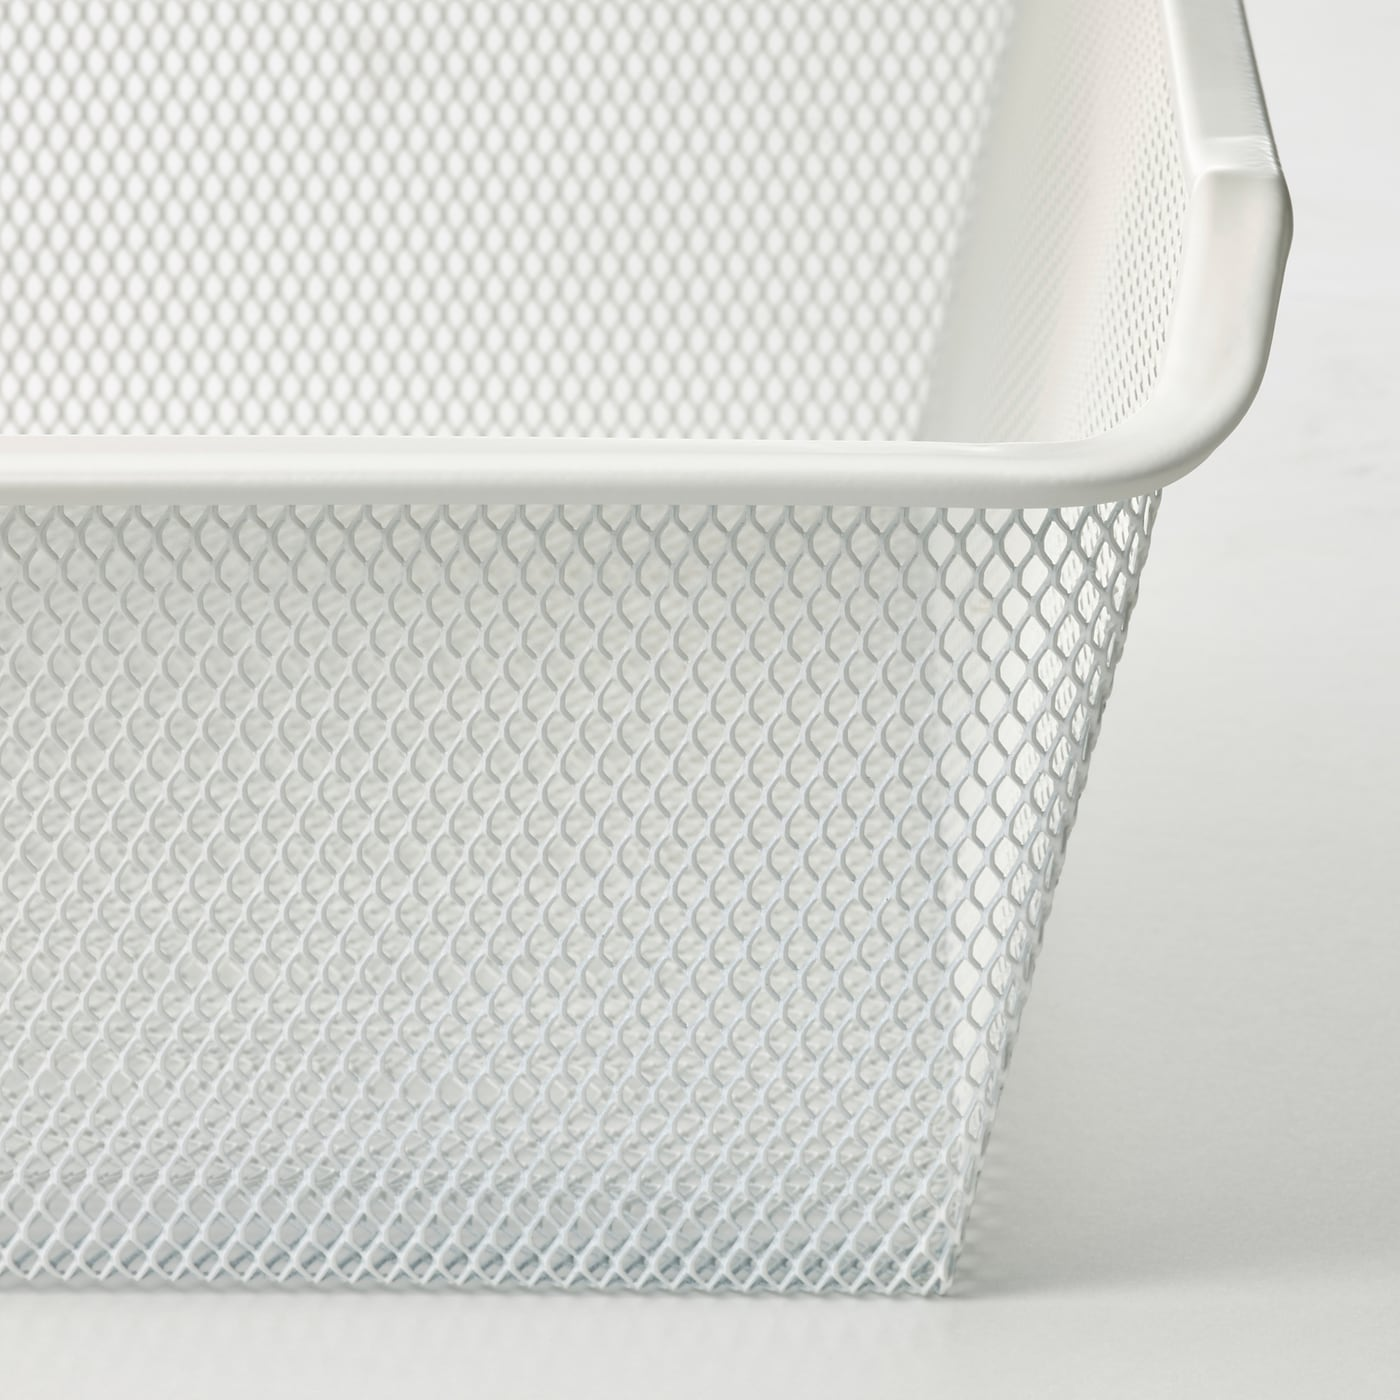 KOMPLEMENT سلة شبكية مع مجرى سحب, أبيض, 50x58 سم